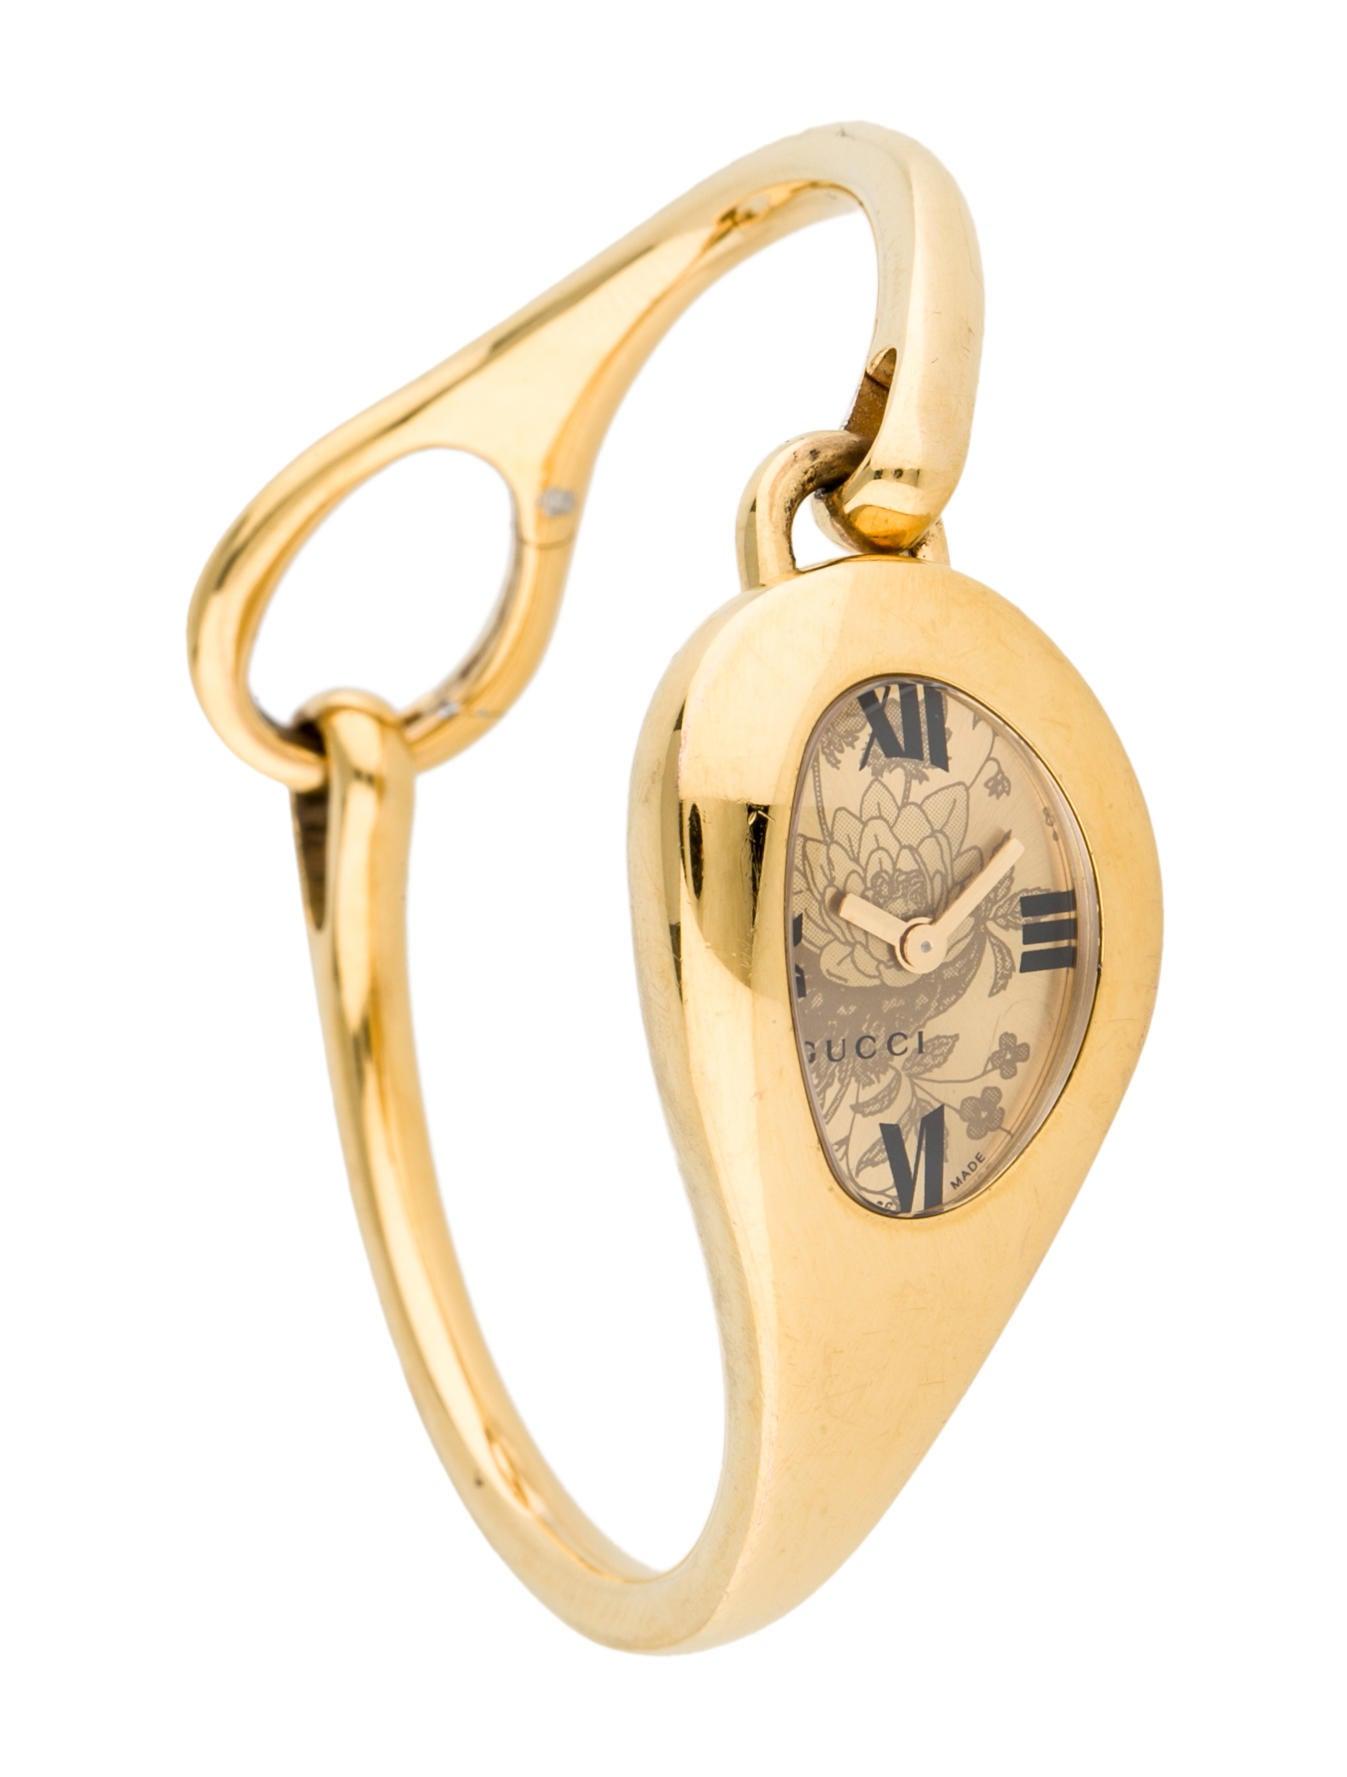 Gucci 103 Watch - Bracelet